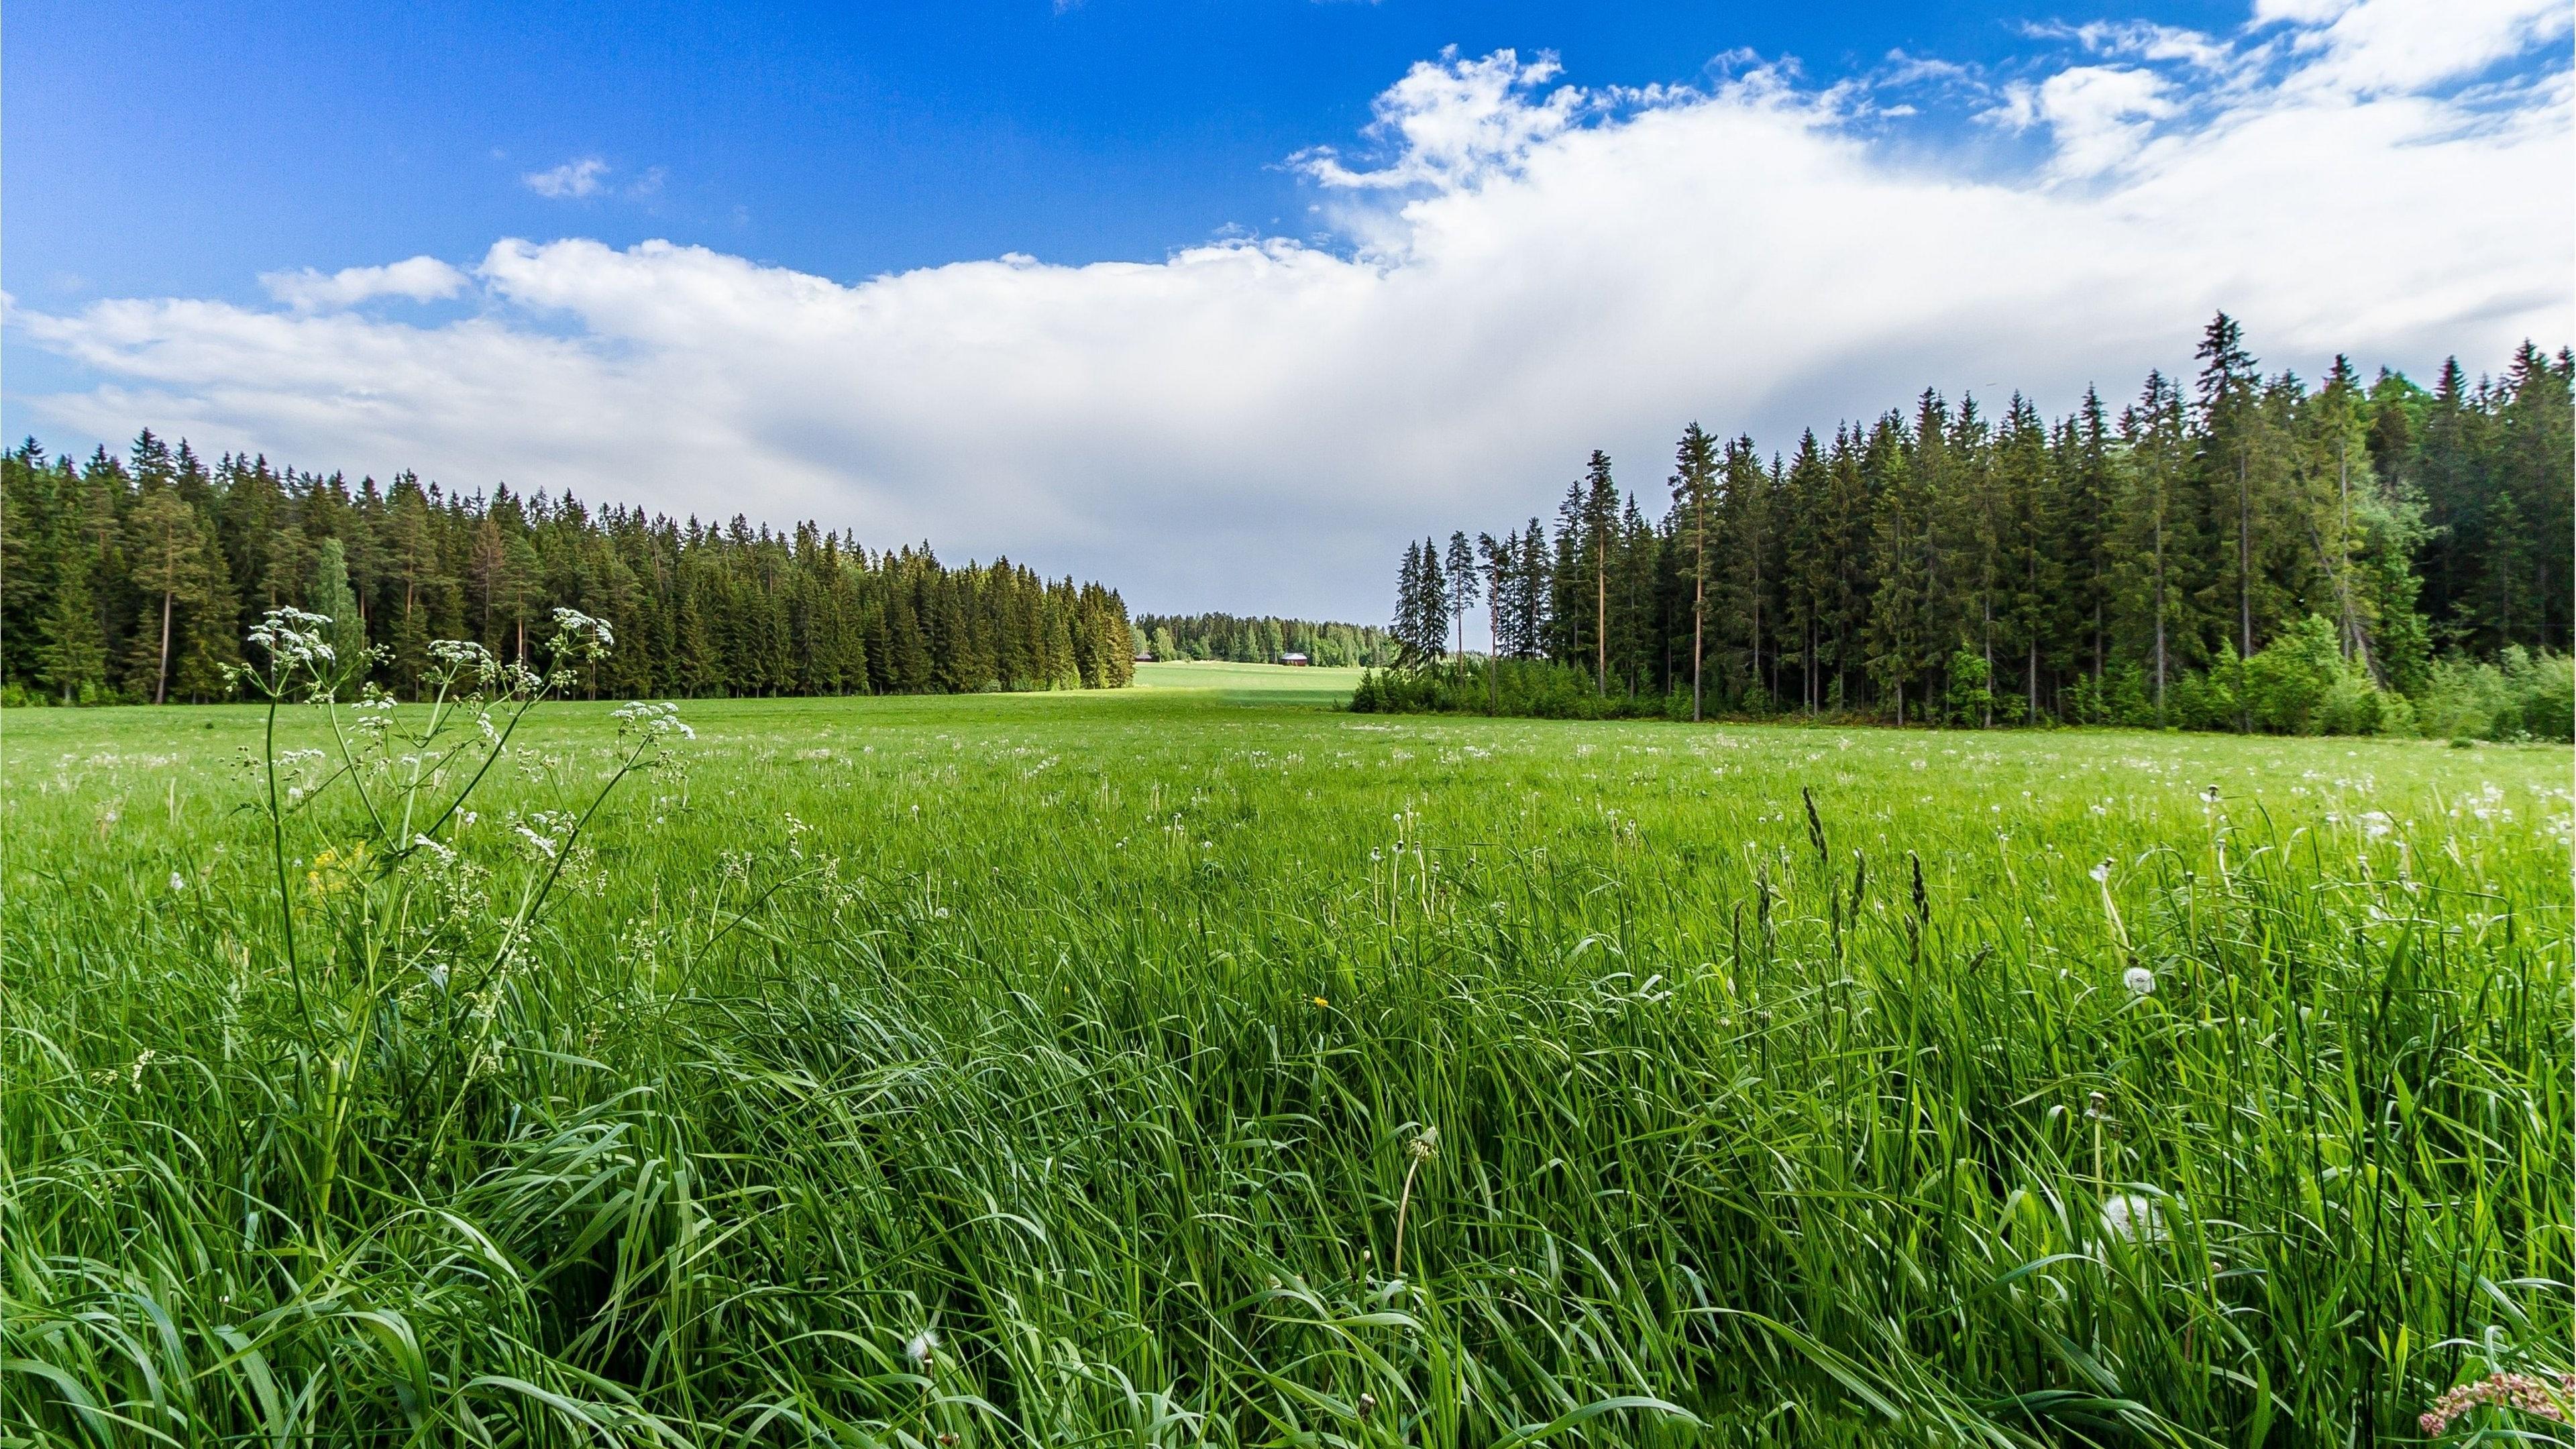 Meadow Forest Sunny Grass Flowers 4K Ultra HD Wallpaper